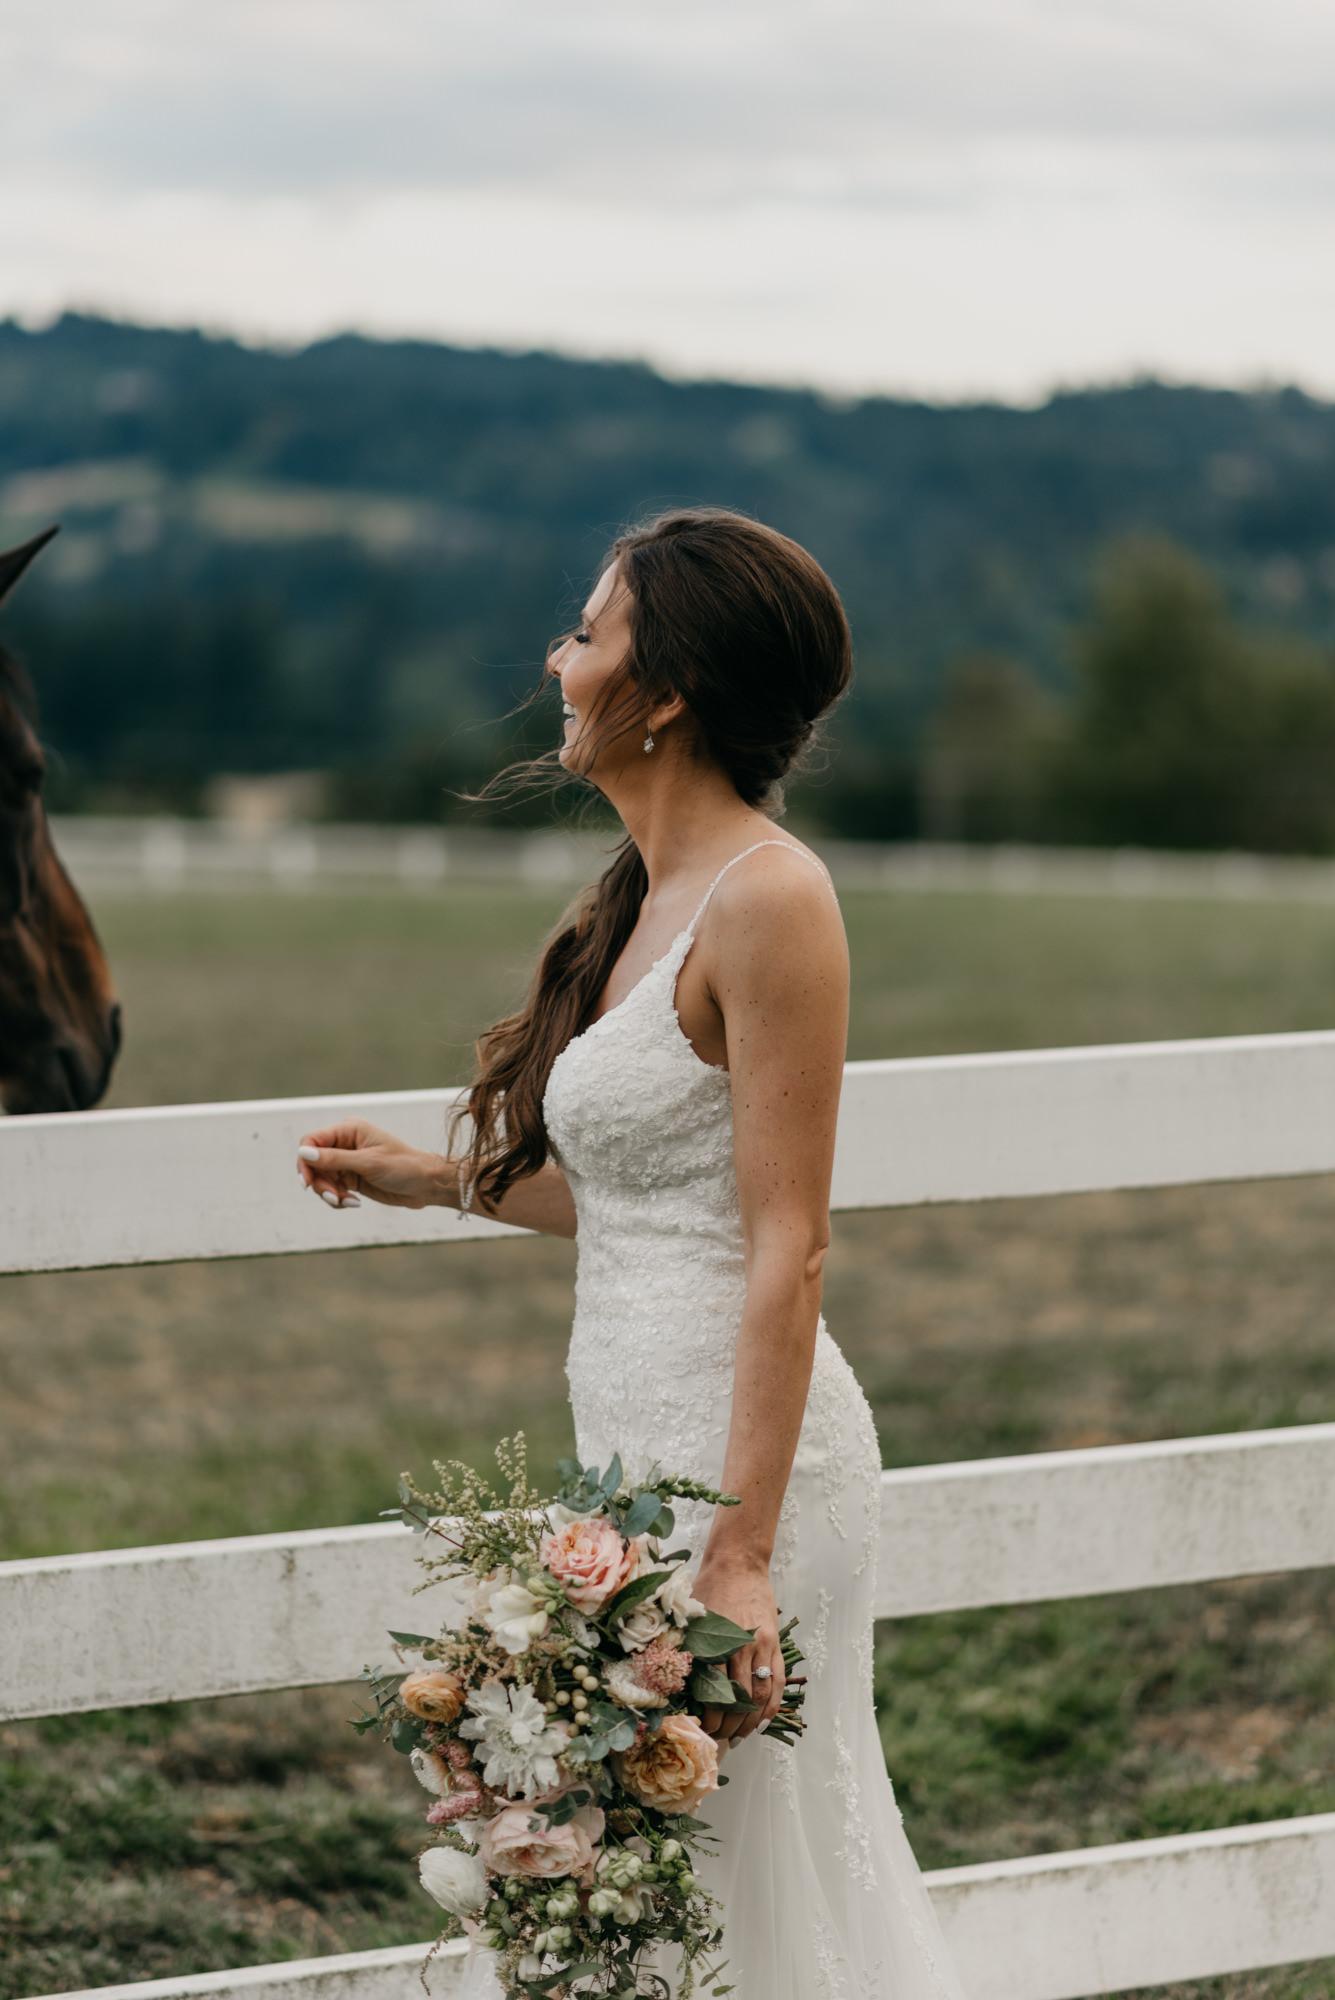 191-barn-kestrel-portland-northwest-horse-sunset-wedding.jpg